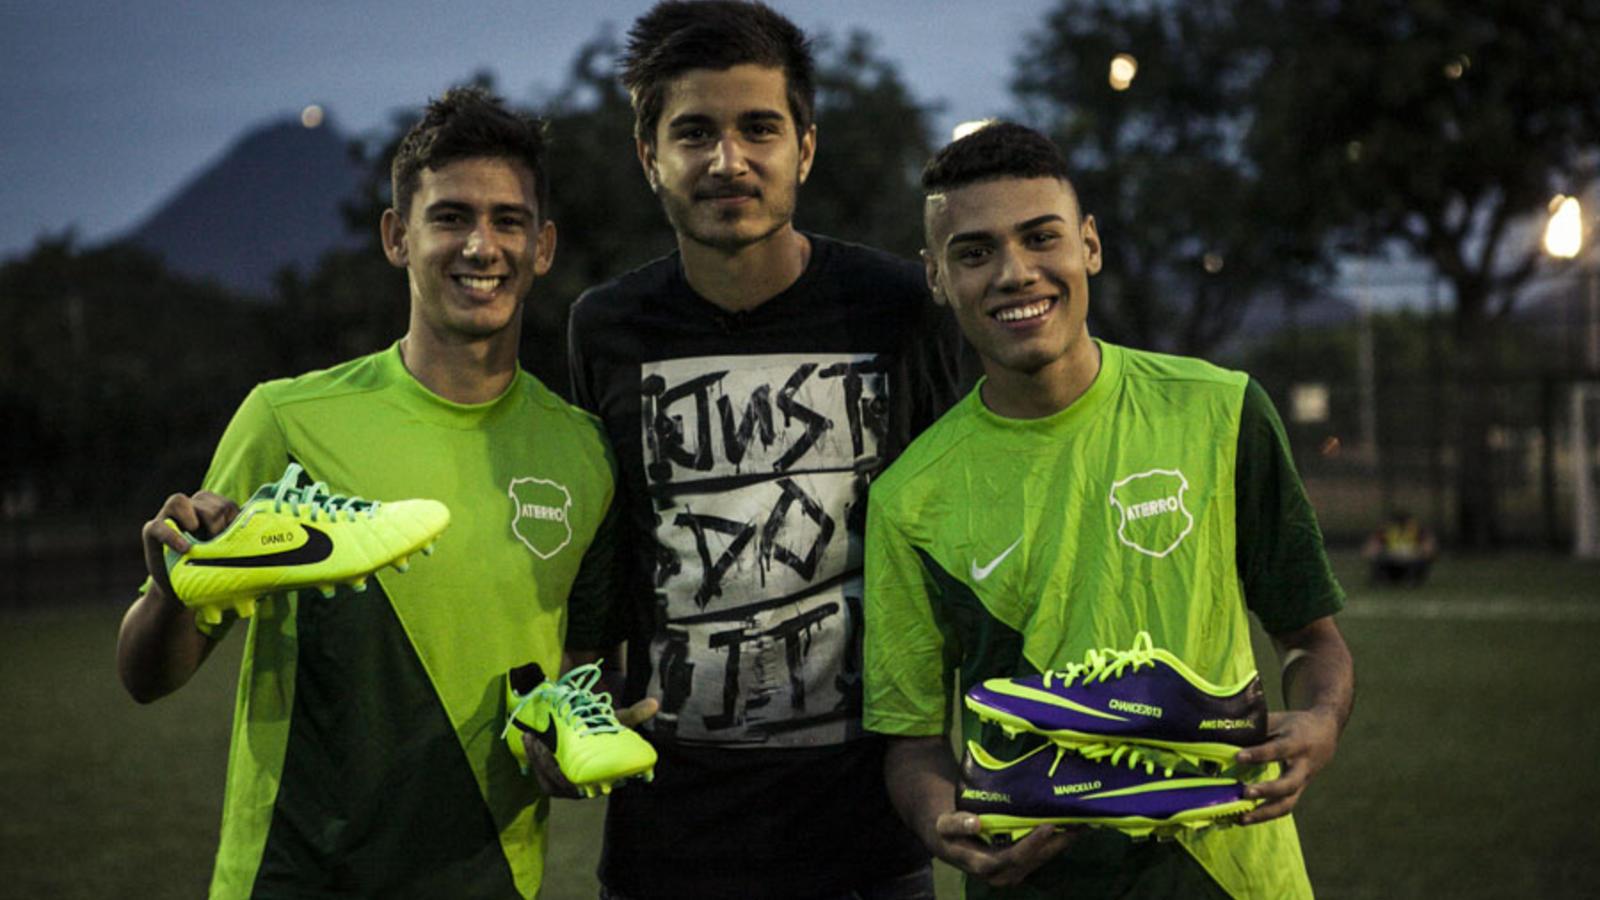 Danilo Mattheus Marcello Nike Chance